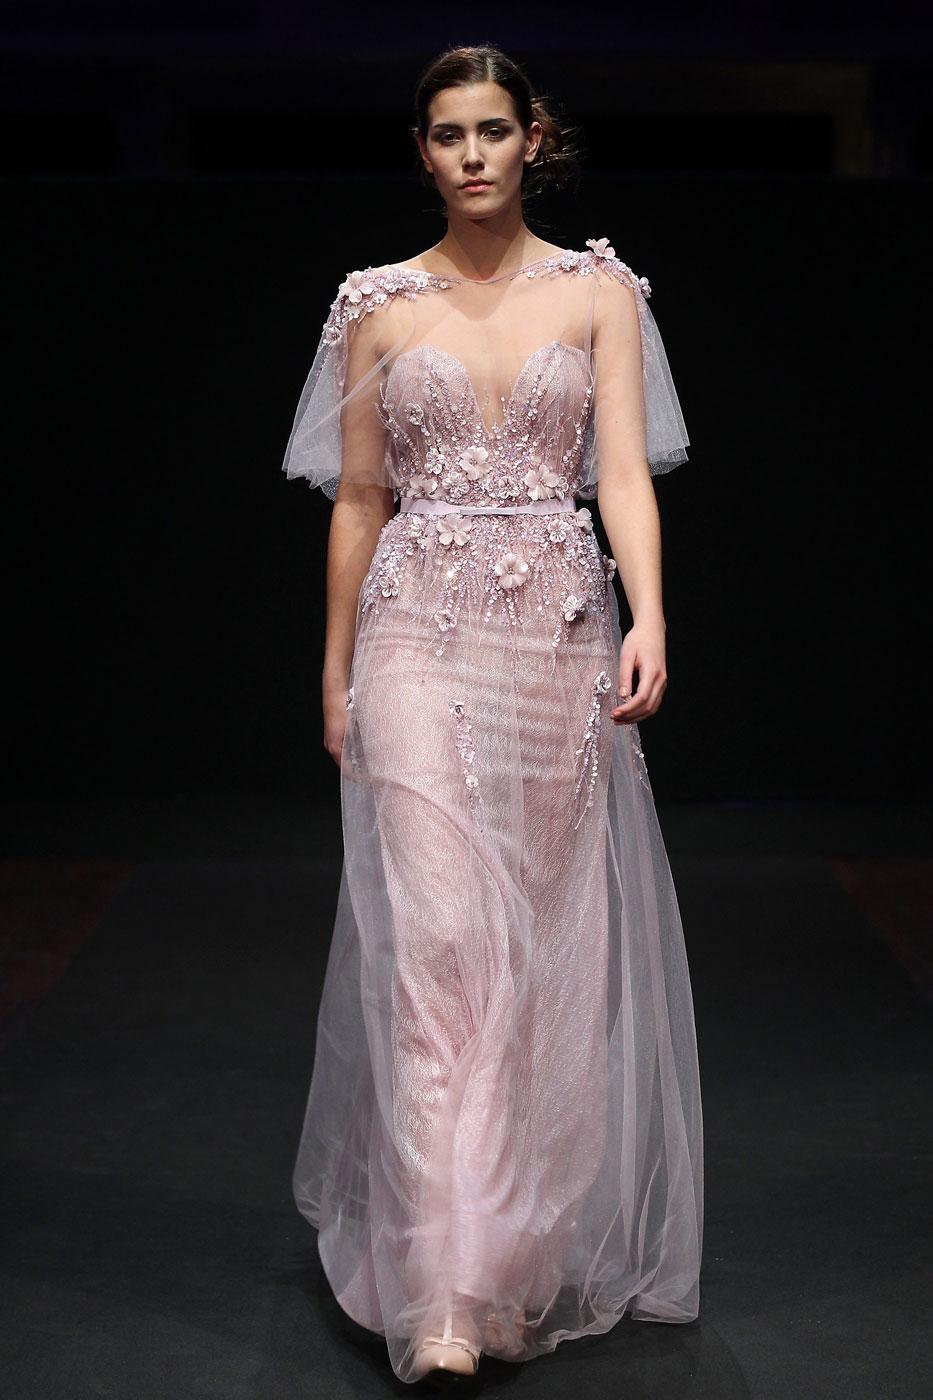 Abed-Mahfouz-fashion-runway-show-haute-couture-paris-spring-2015-the-impression-14